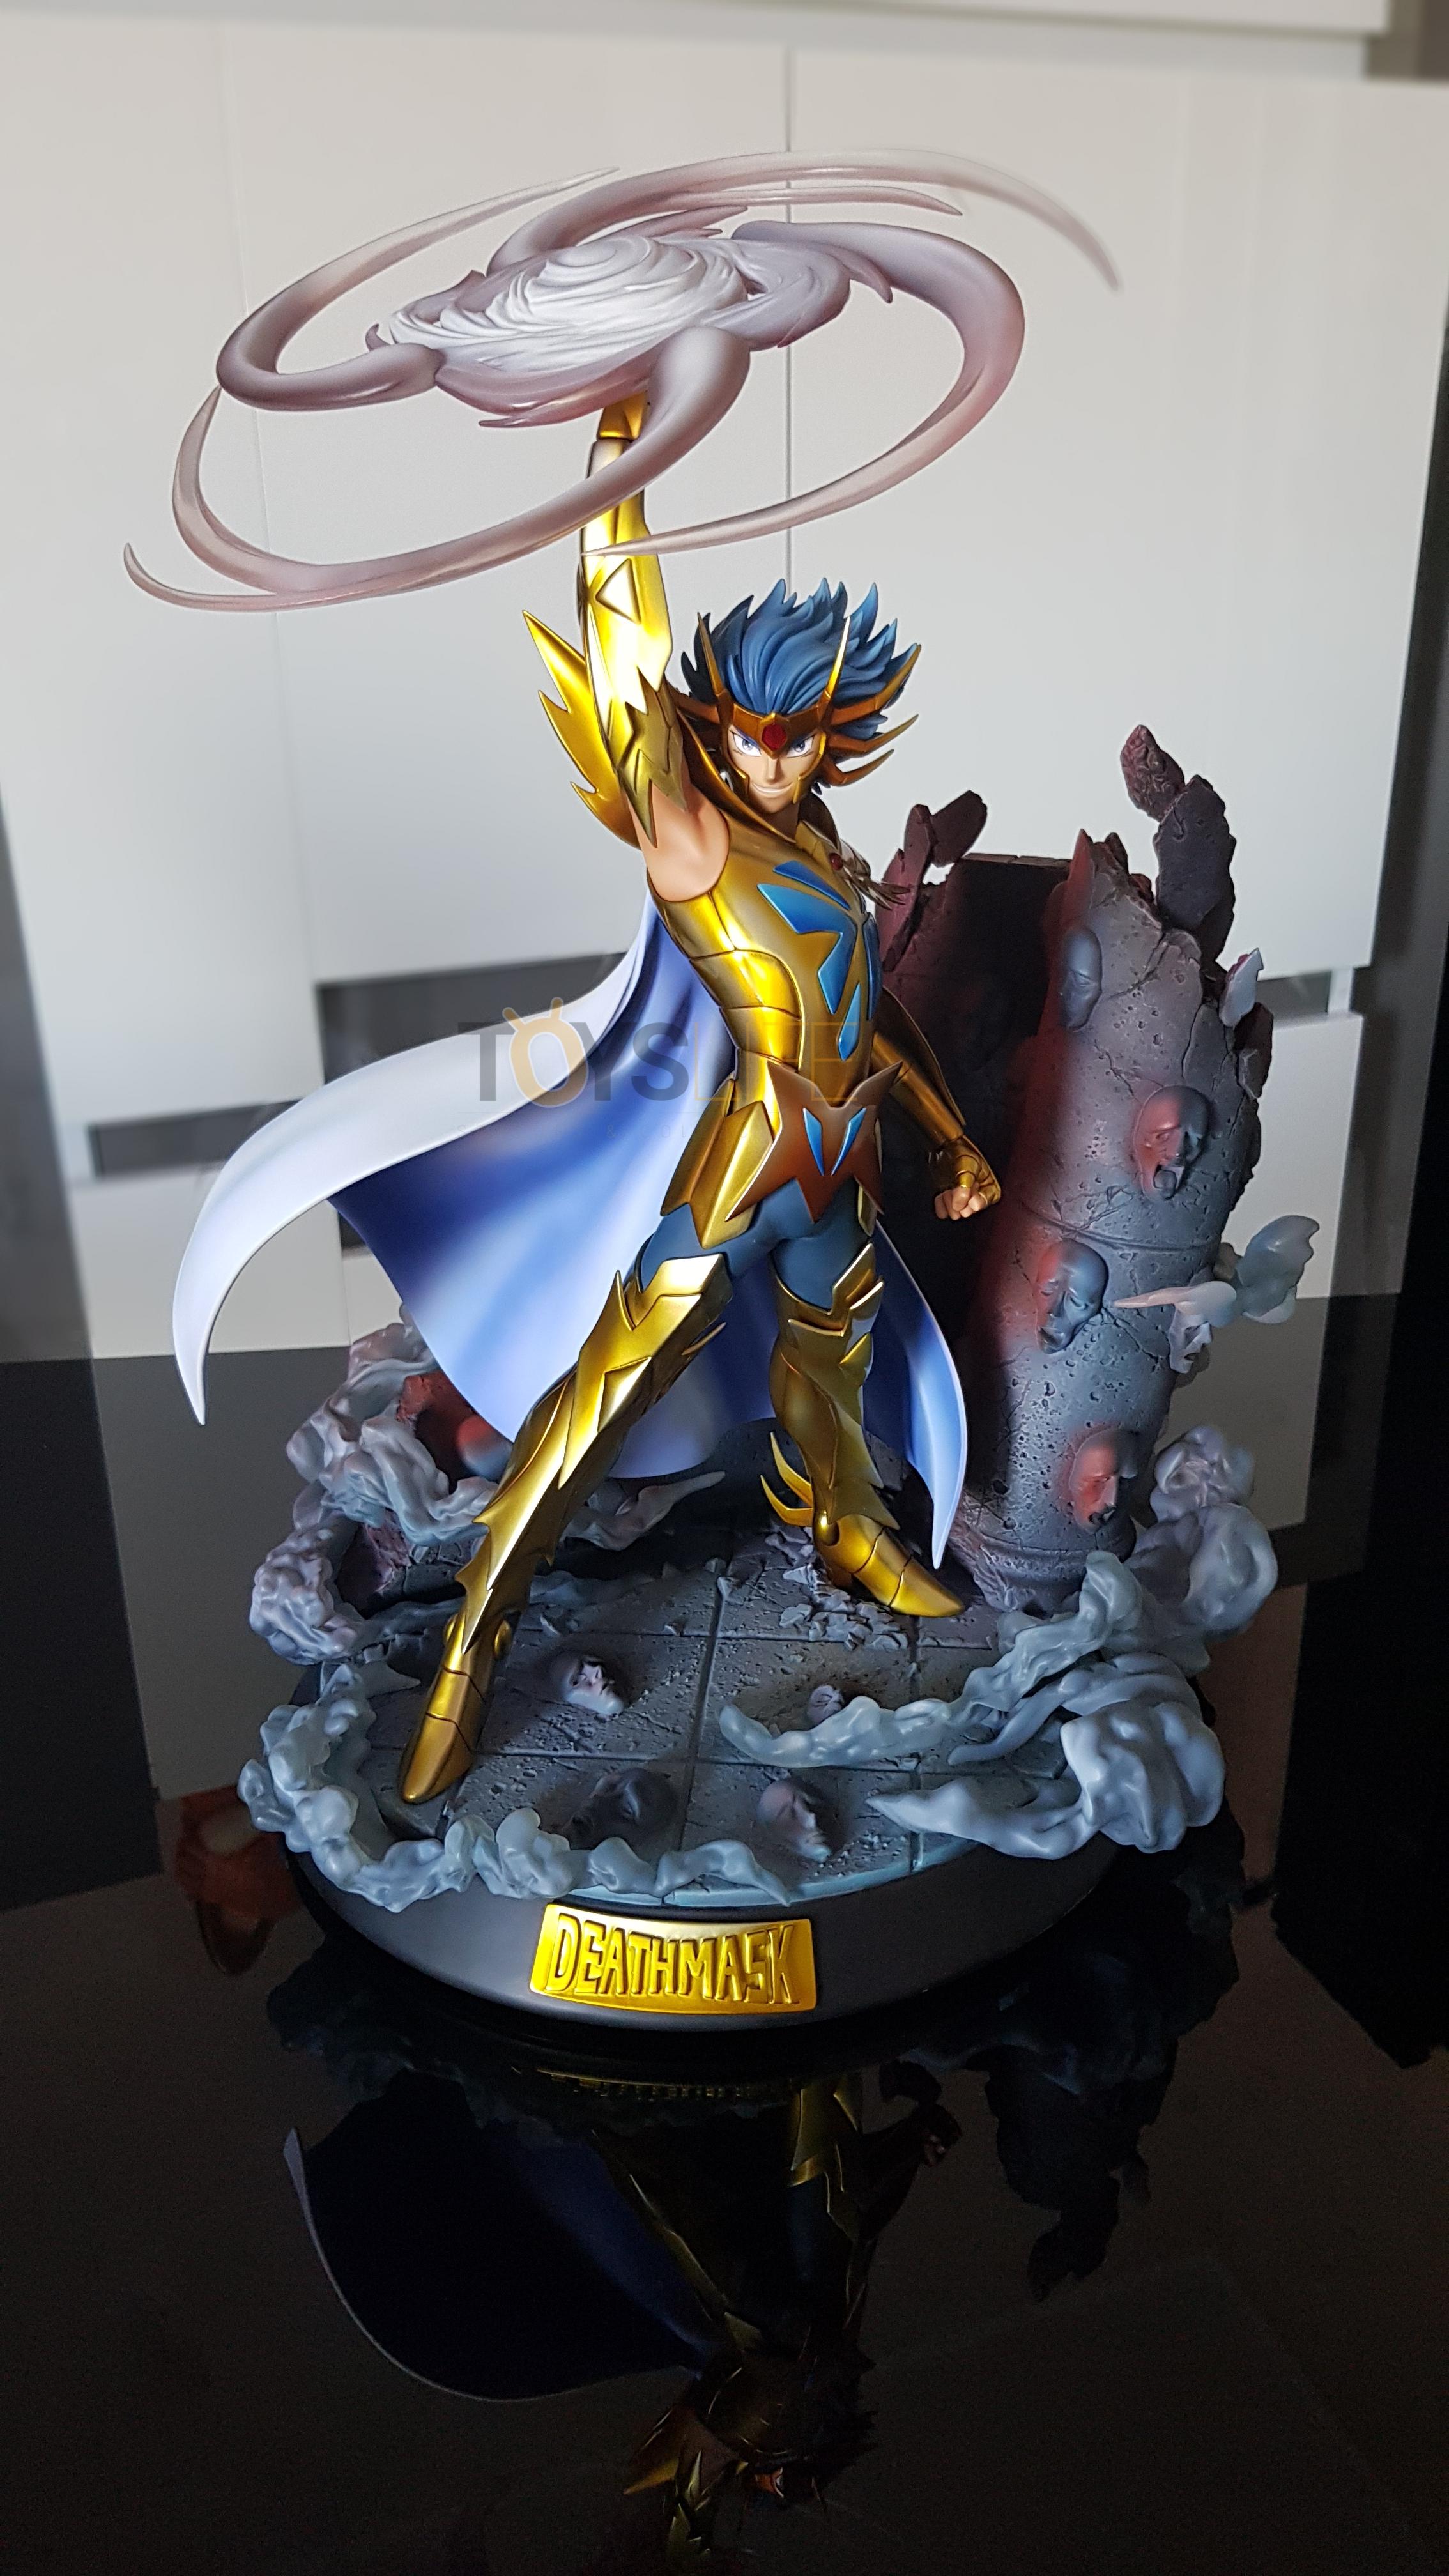 tsume-art-saint-seiya-gold-saint-death-mask-statue-toyslife-review-32